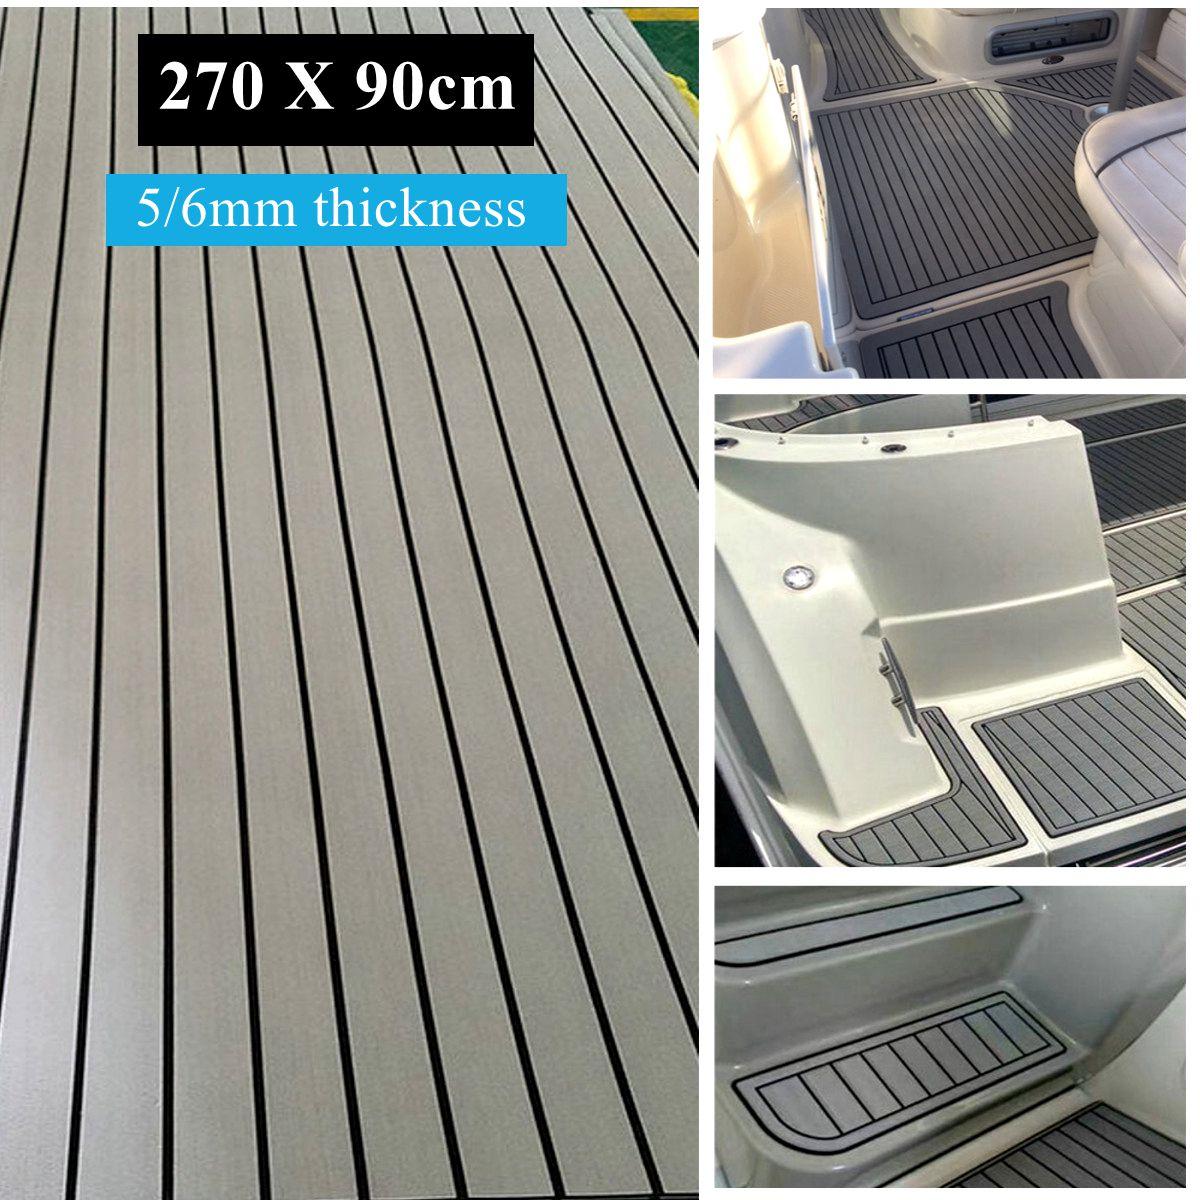 "1Pcs 35"" x 106"" 5mm Thickness Boat Teak Decking Sheet Yacht Flooring EVA Foam Floor Sheet Self-Adhesive, Grey with Black seam line"